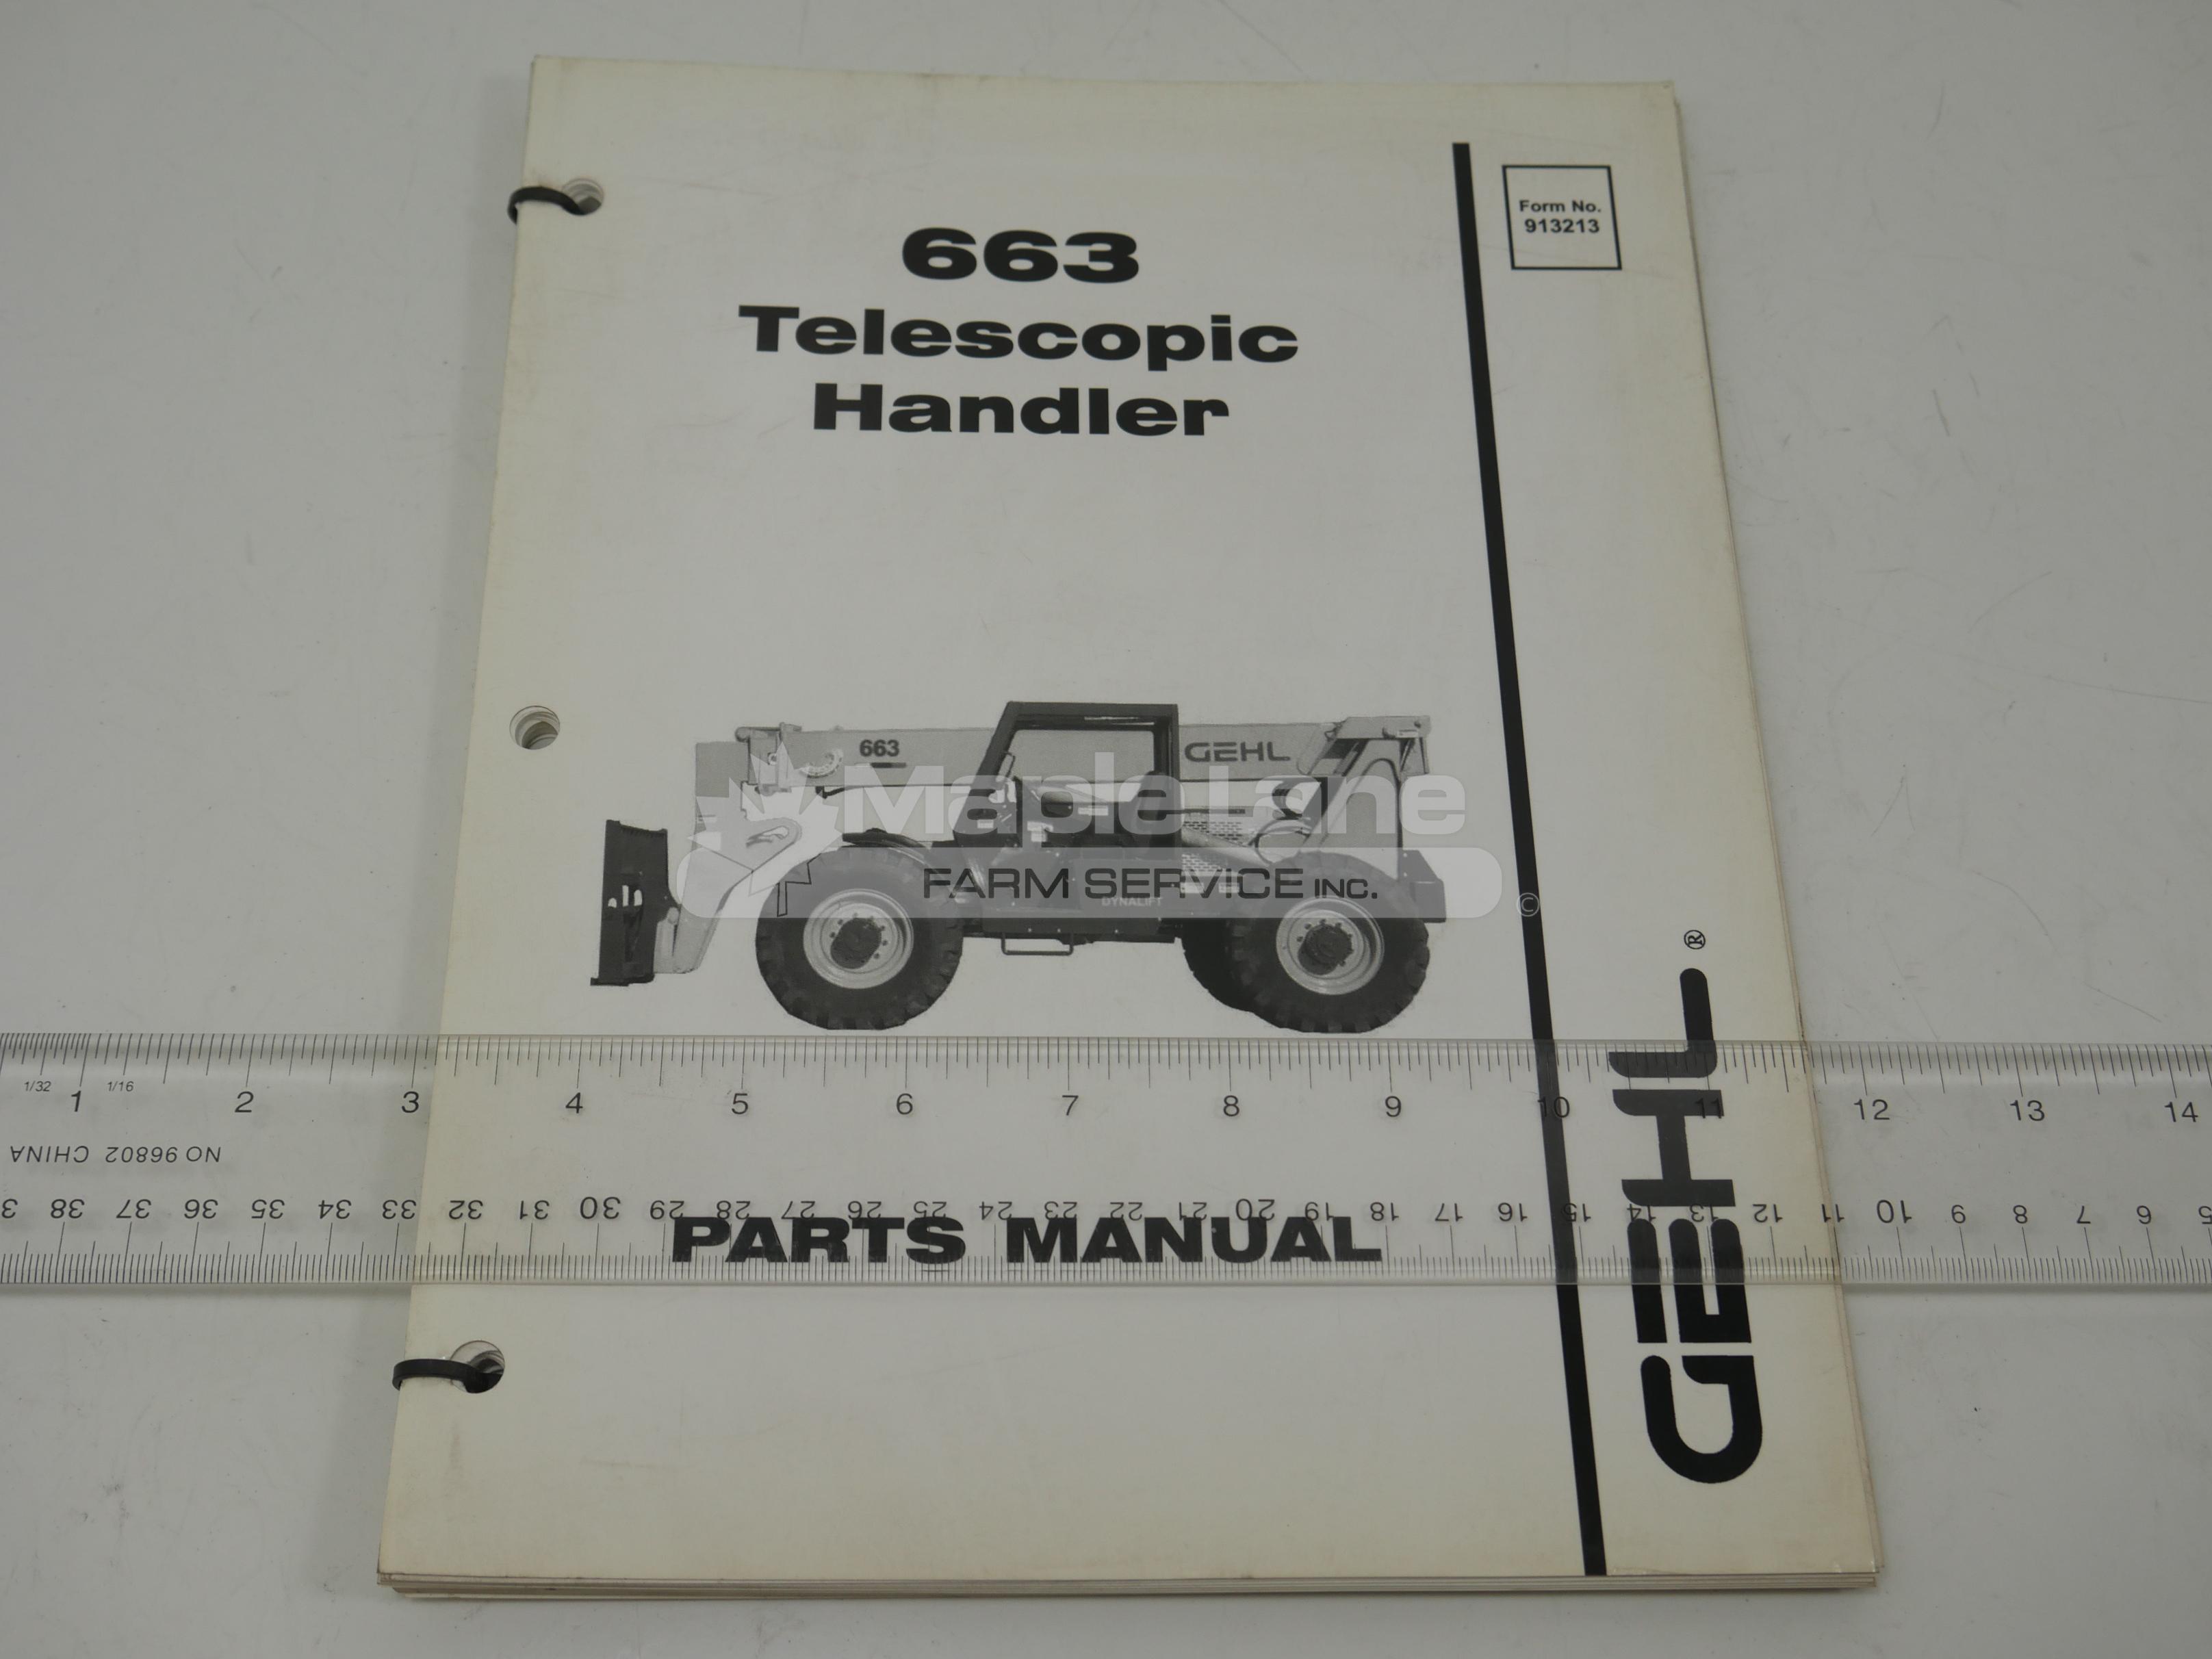 913213 6 Parts Manual